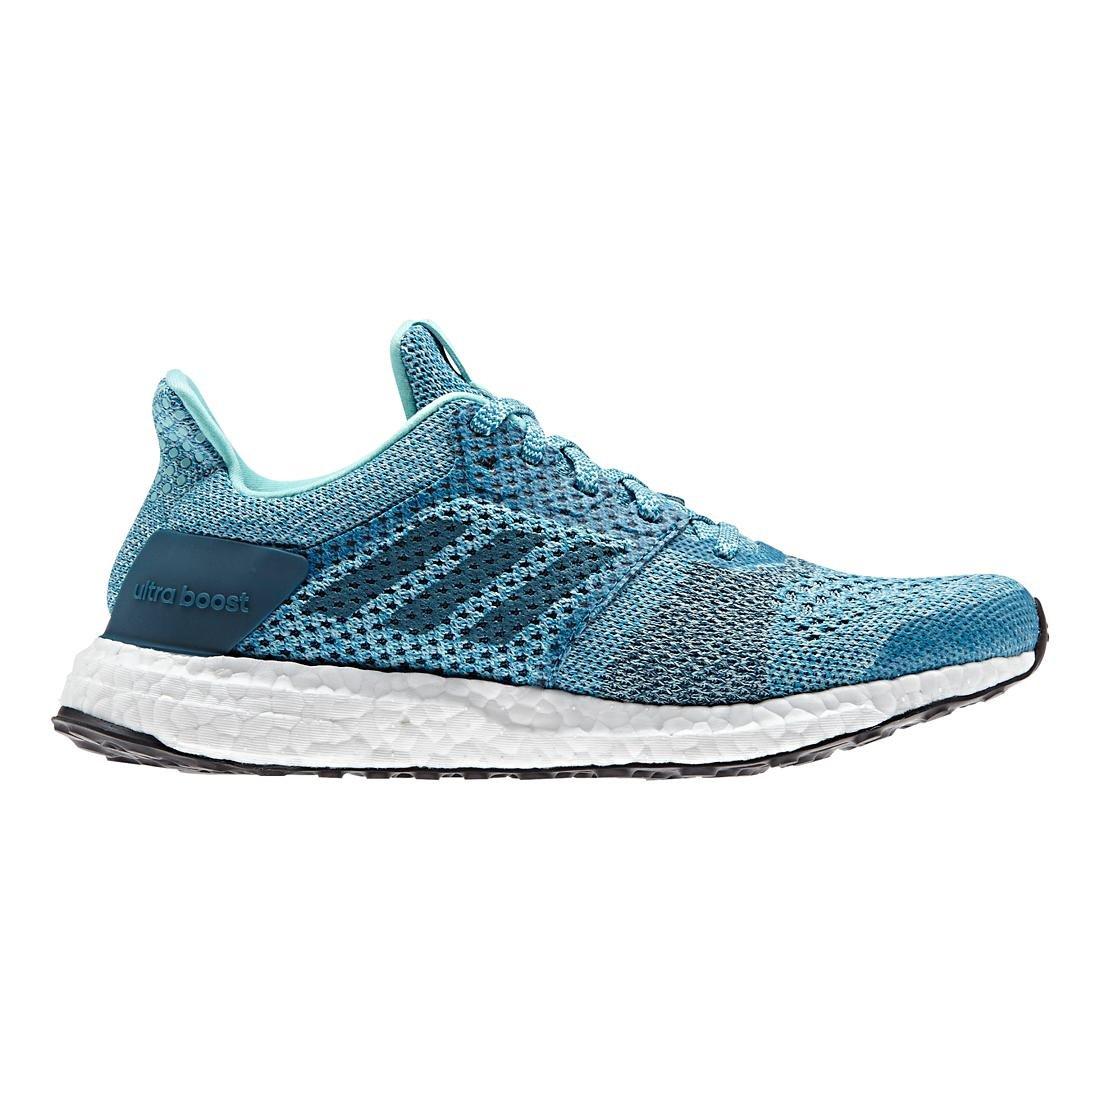 Aqua Silver Adidas Womens Ultraboost ST Running shoes